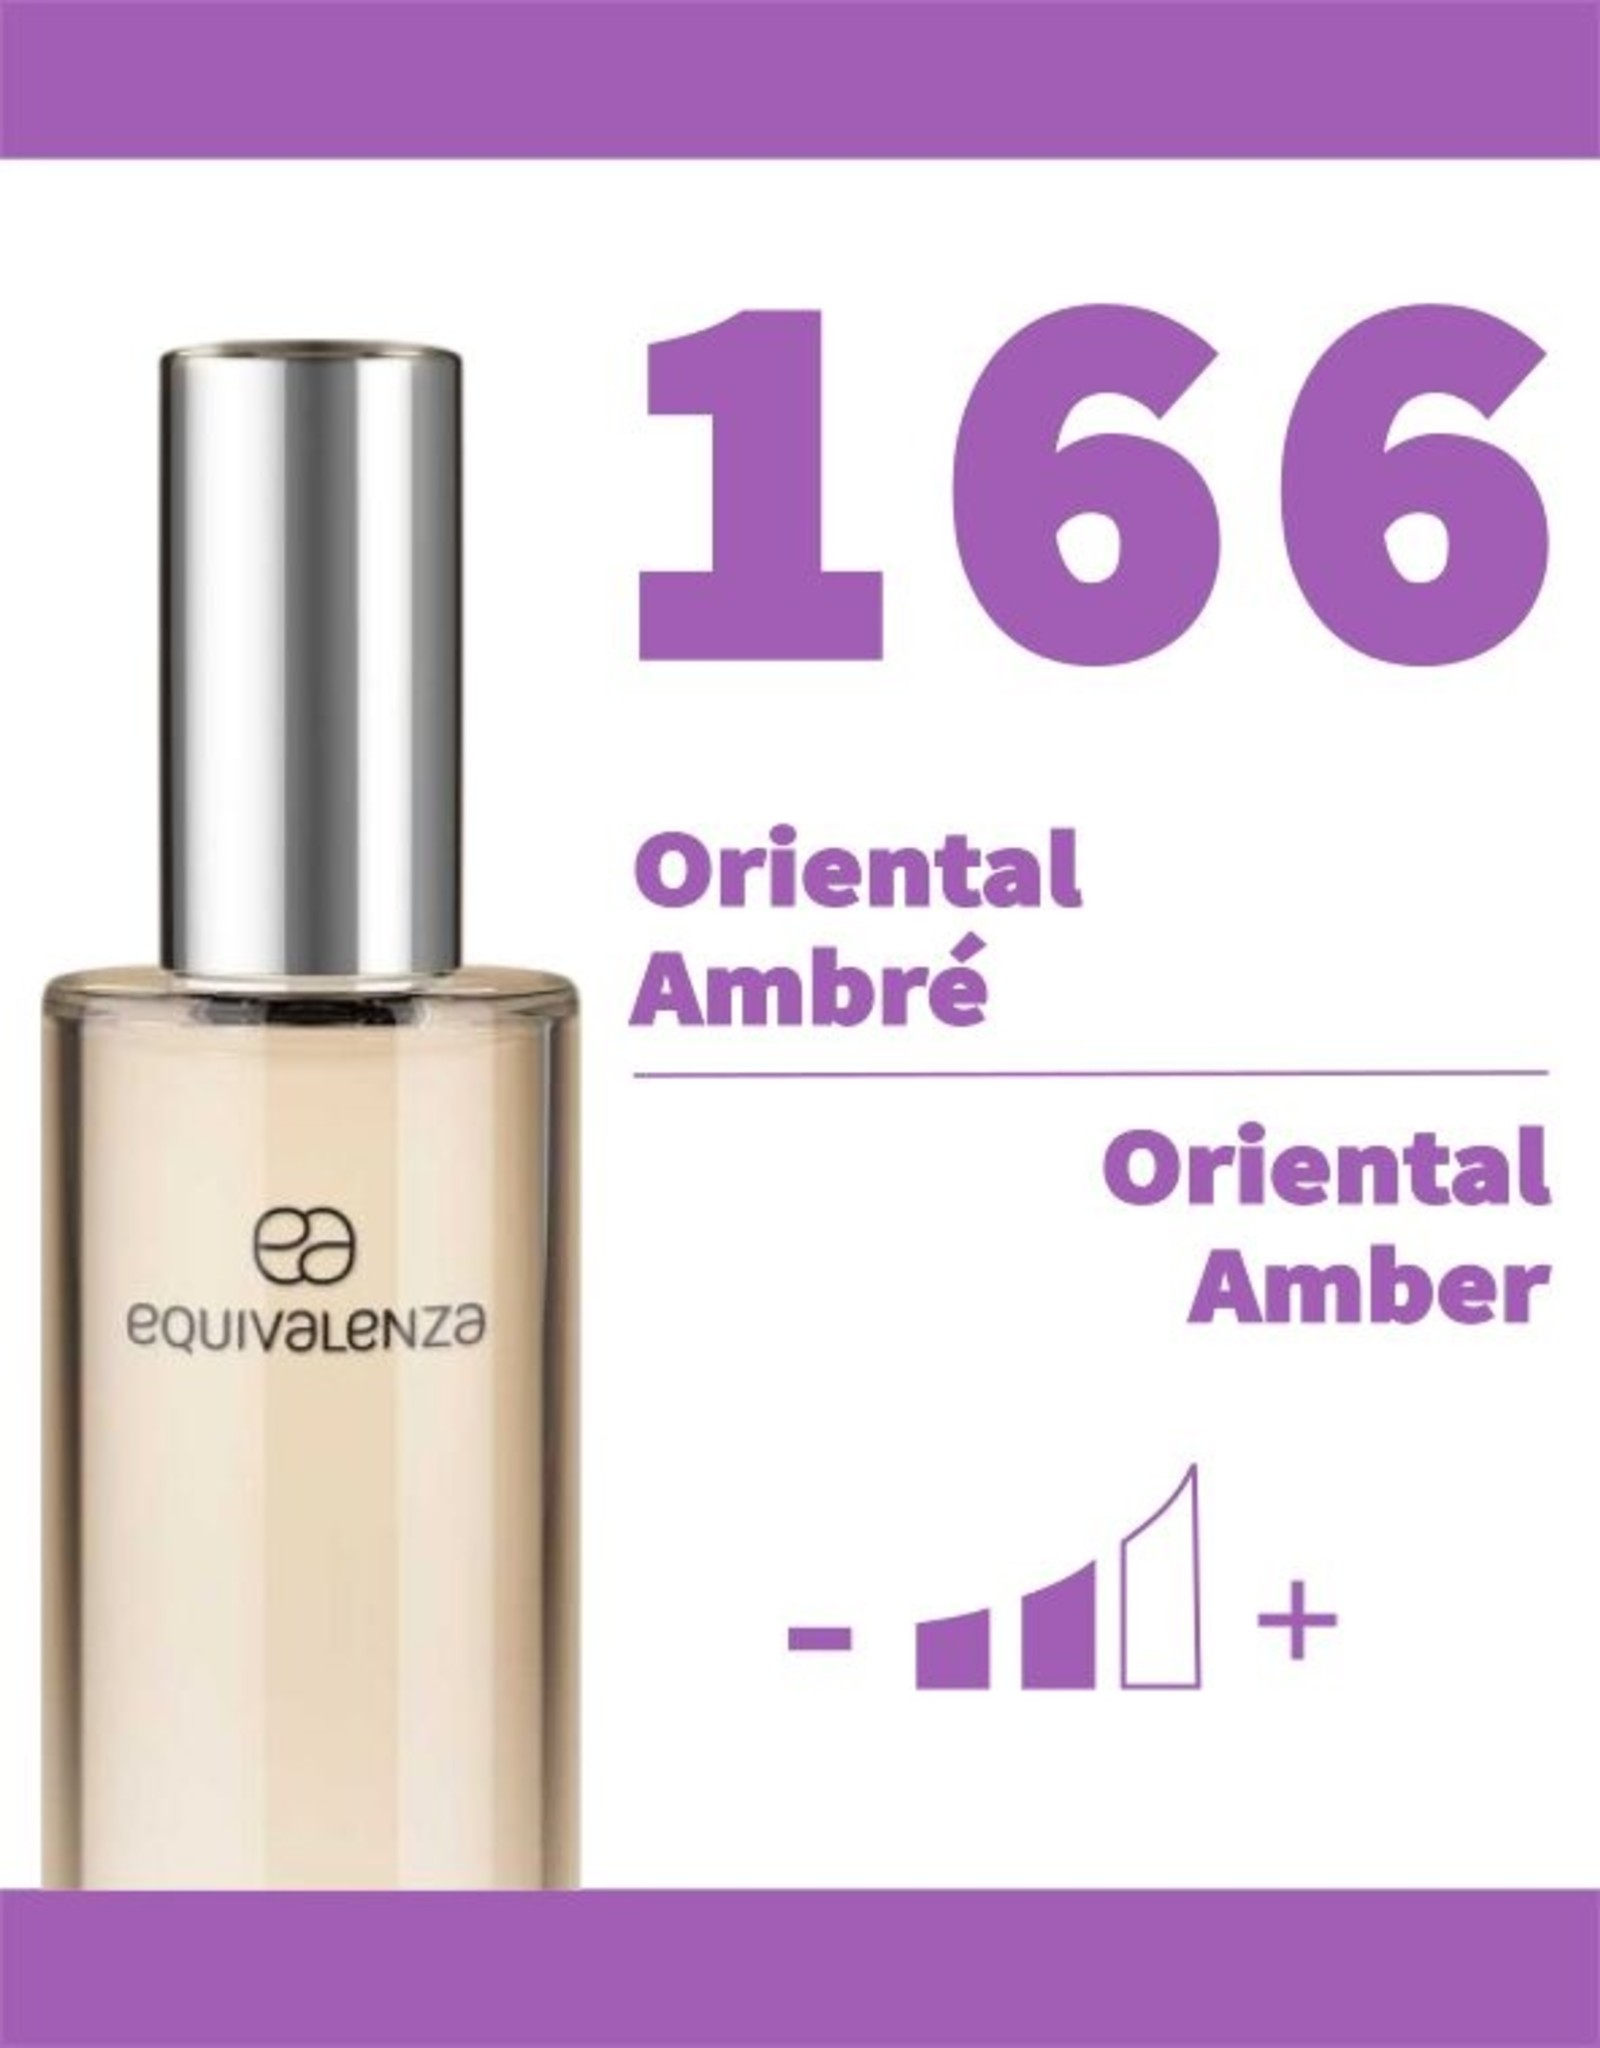 Equivalenza Eau de Parfum Oriental Amber 166